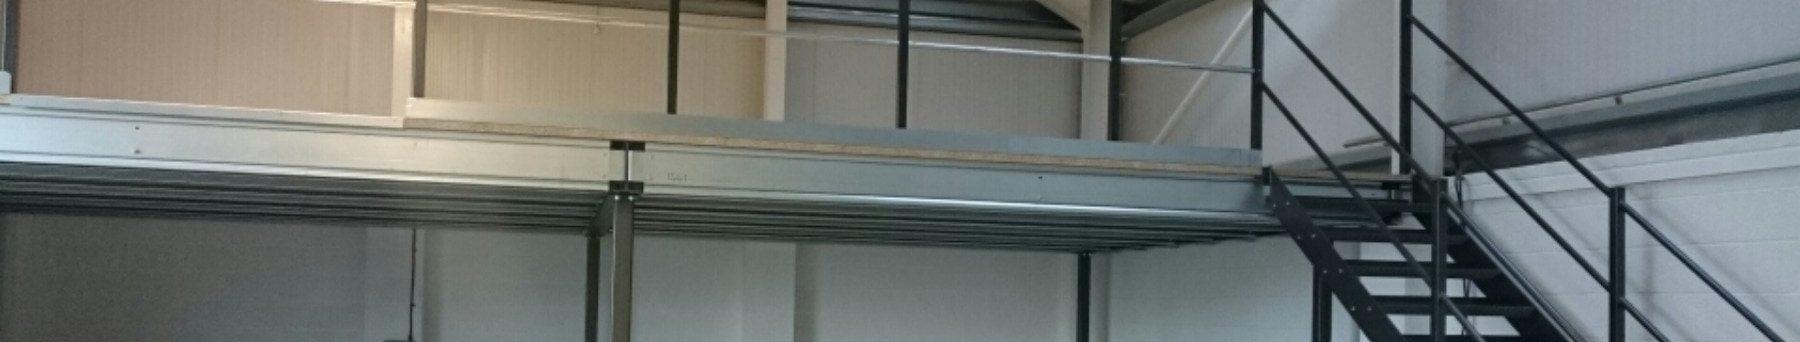 Mezzanine Floors Bristol Banner